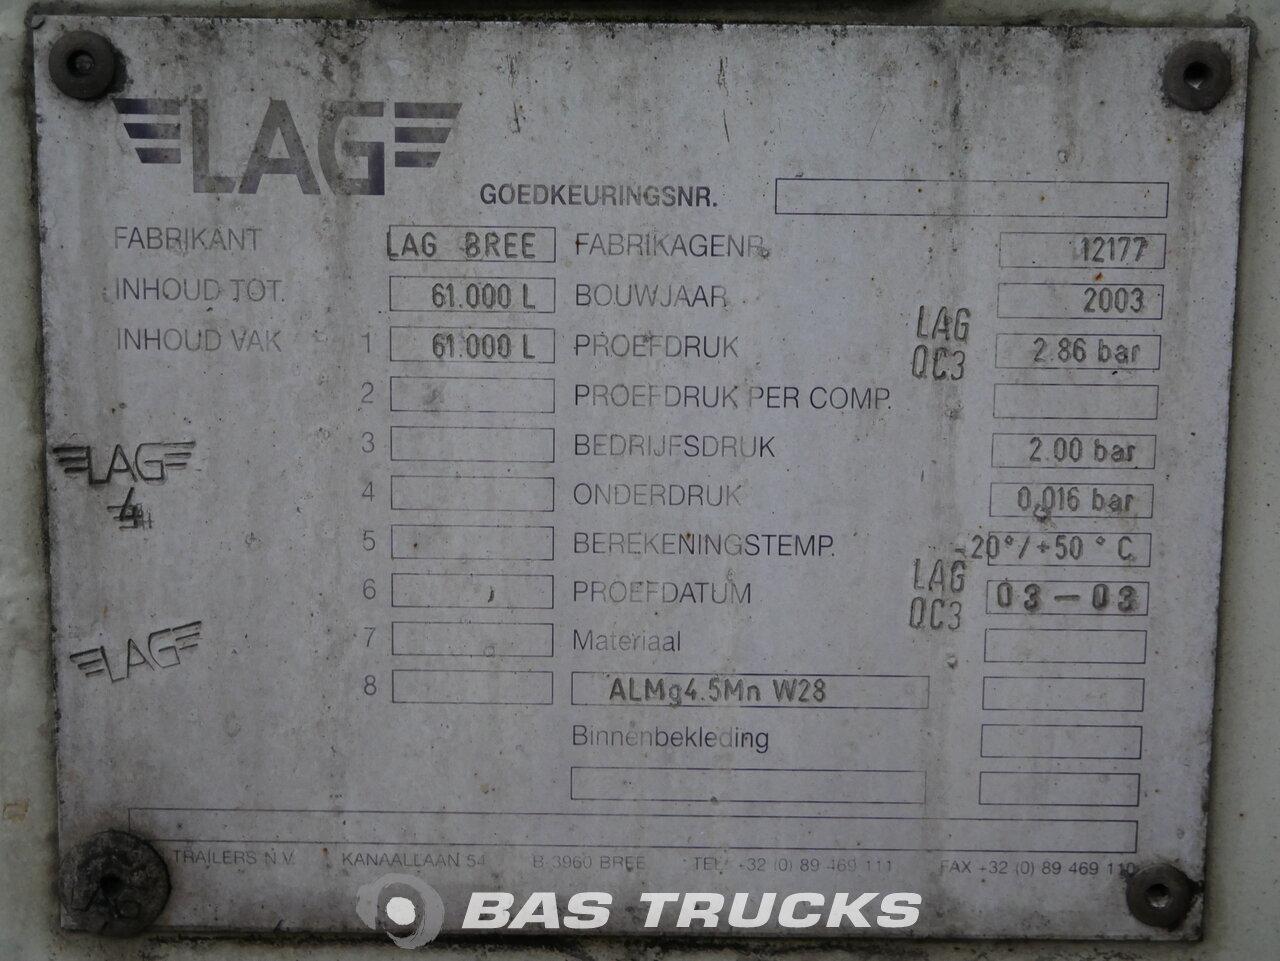 foto de Usado Semirremolque L.A.G. 61.000 Ltr Kippanlage O-3-40-02 3 Ejes 2003